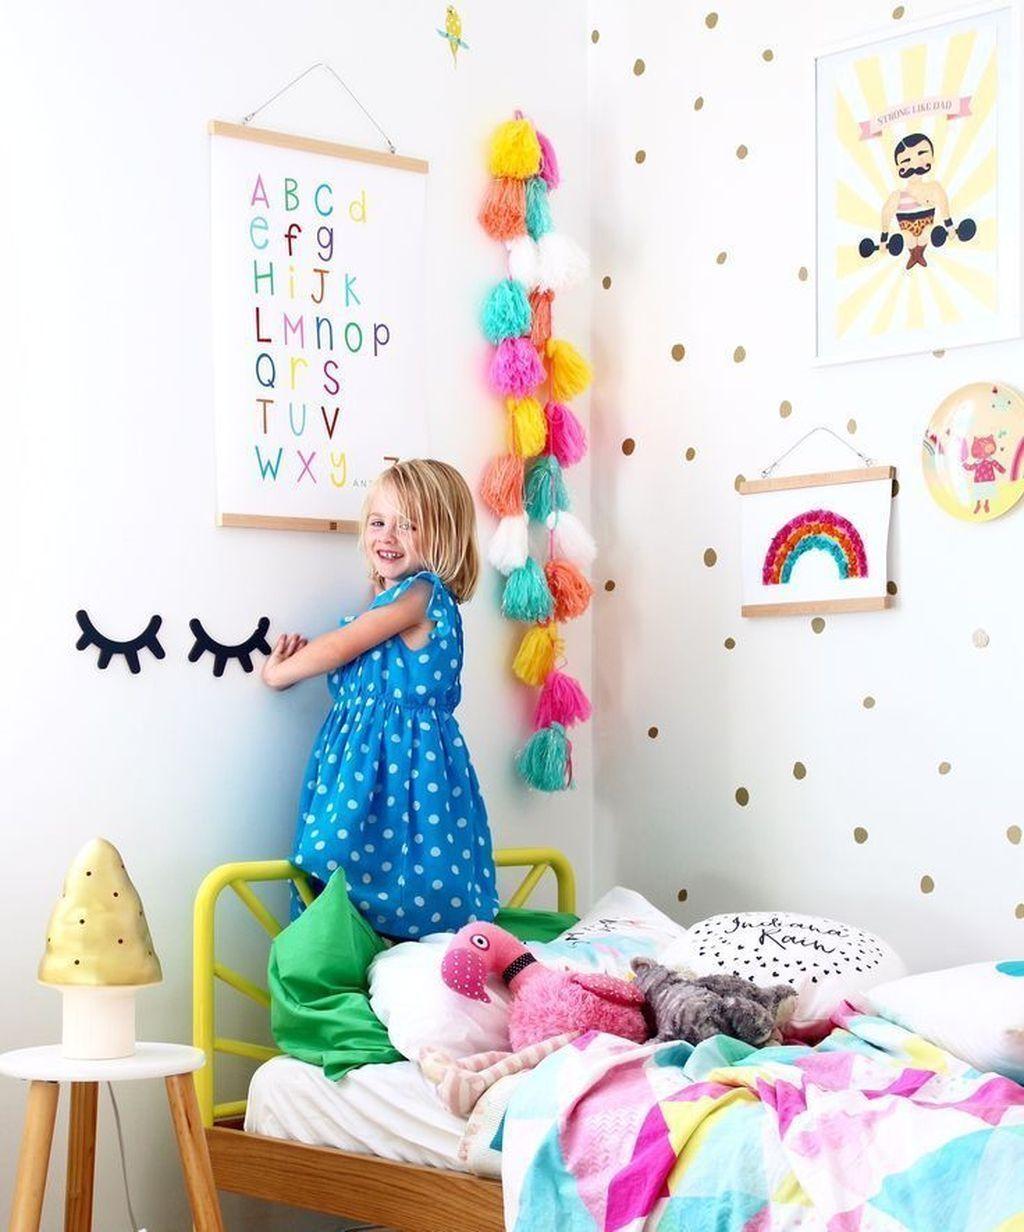 39 Elegant Kids Bedroom Design Ideas For Little Girls images